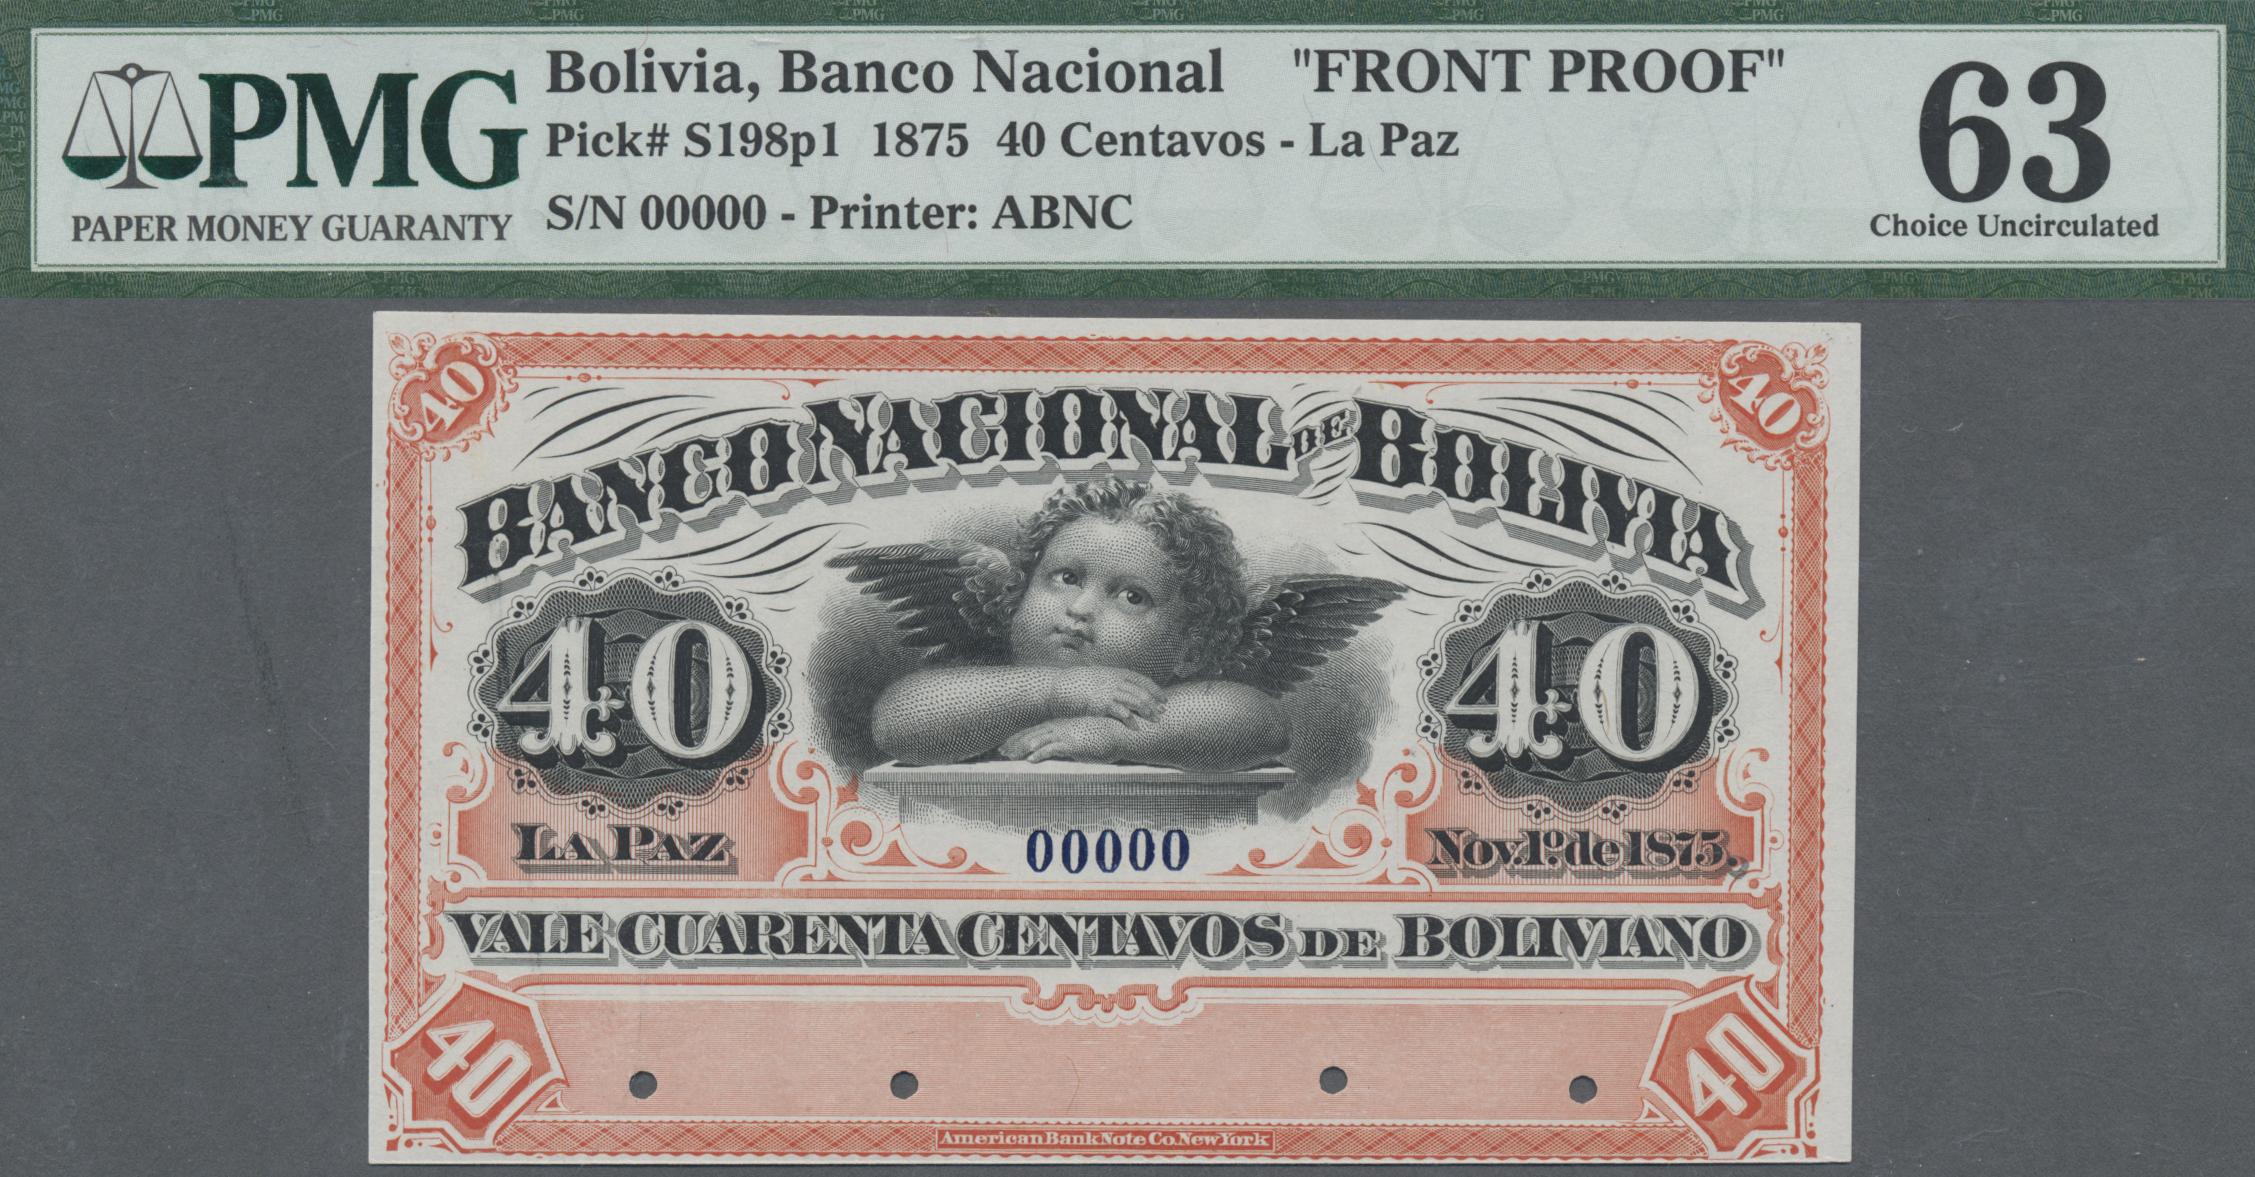 Lot 00066 - Bolivia / Bolivien | Banknoten  -  Auktionshaus Christoph Gärtner GmbH & Co. KG Sale #48 The Banknotes